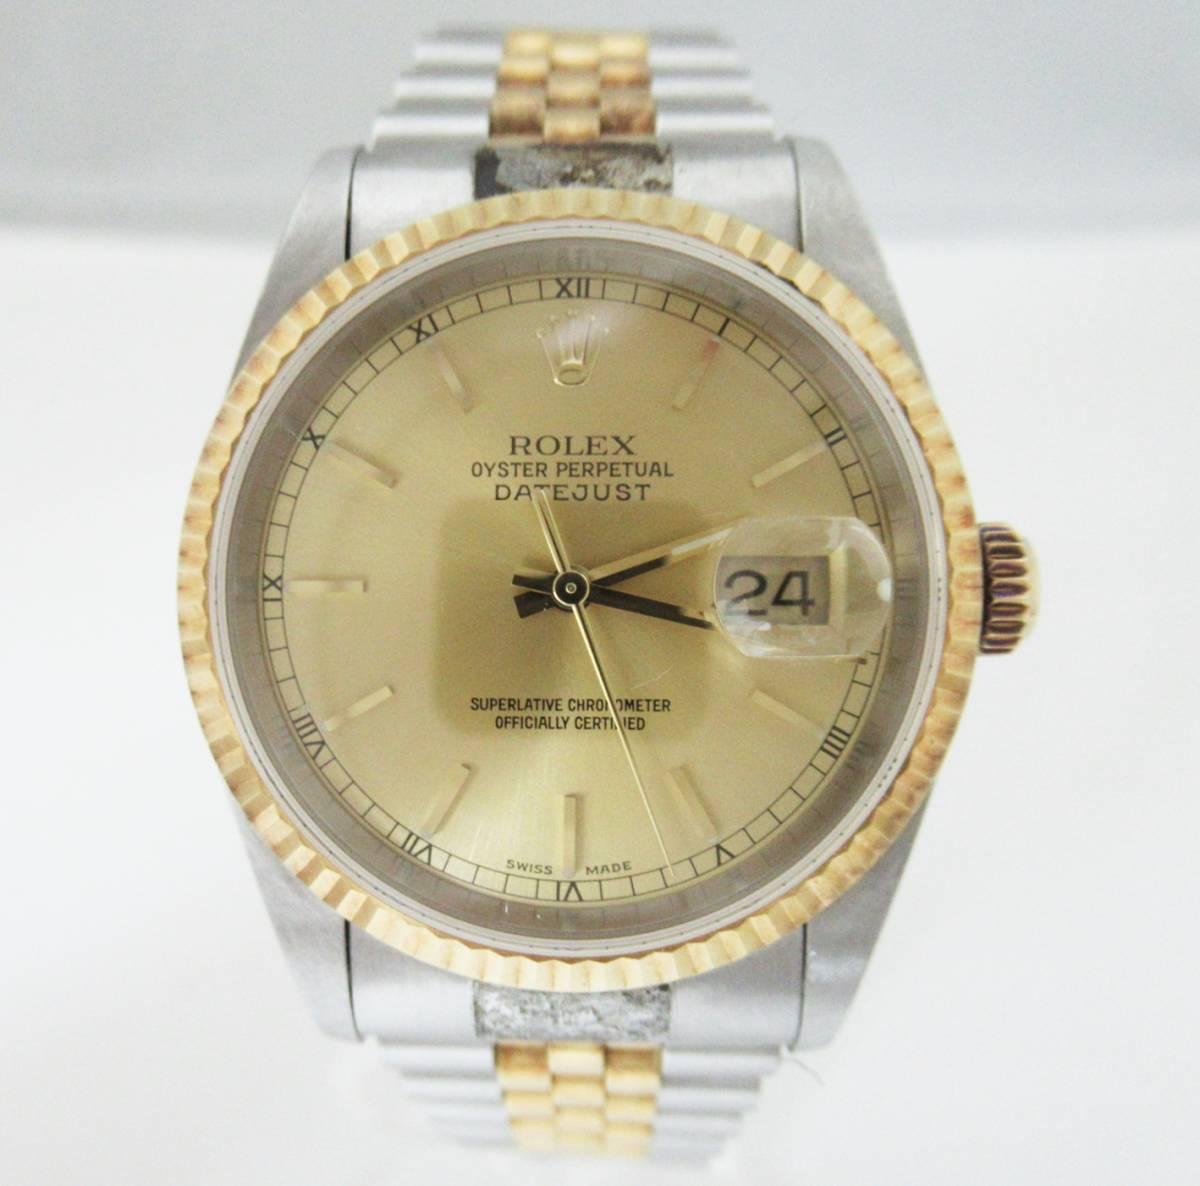 ★D0107★1円★ジャンク品 ROLEX ロレックス デイトジャスト 16233 P番 メンズ腕時計 稼